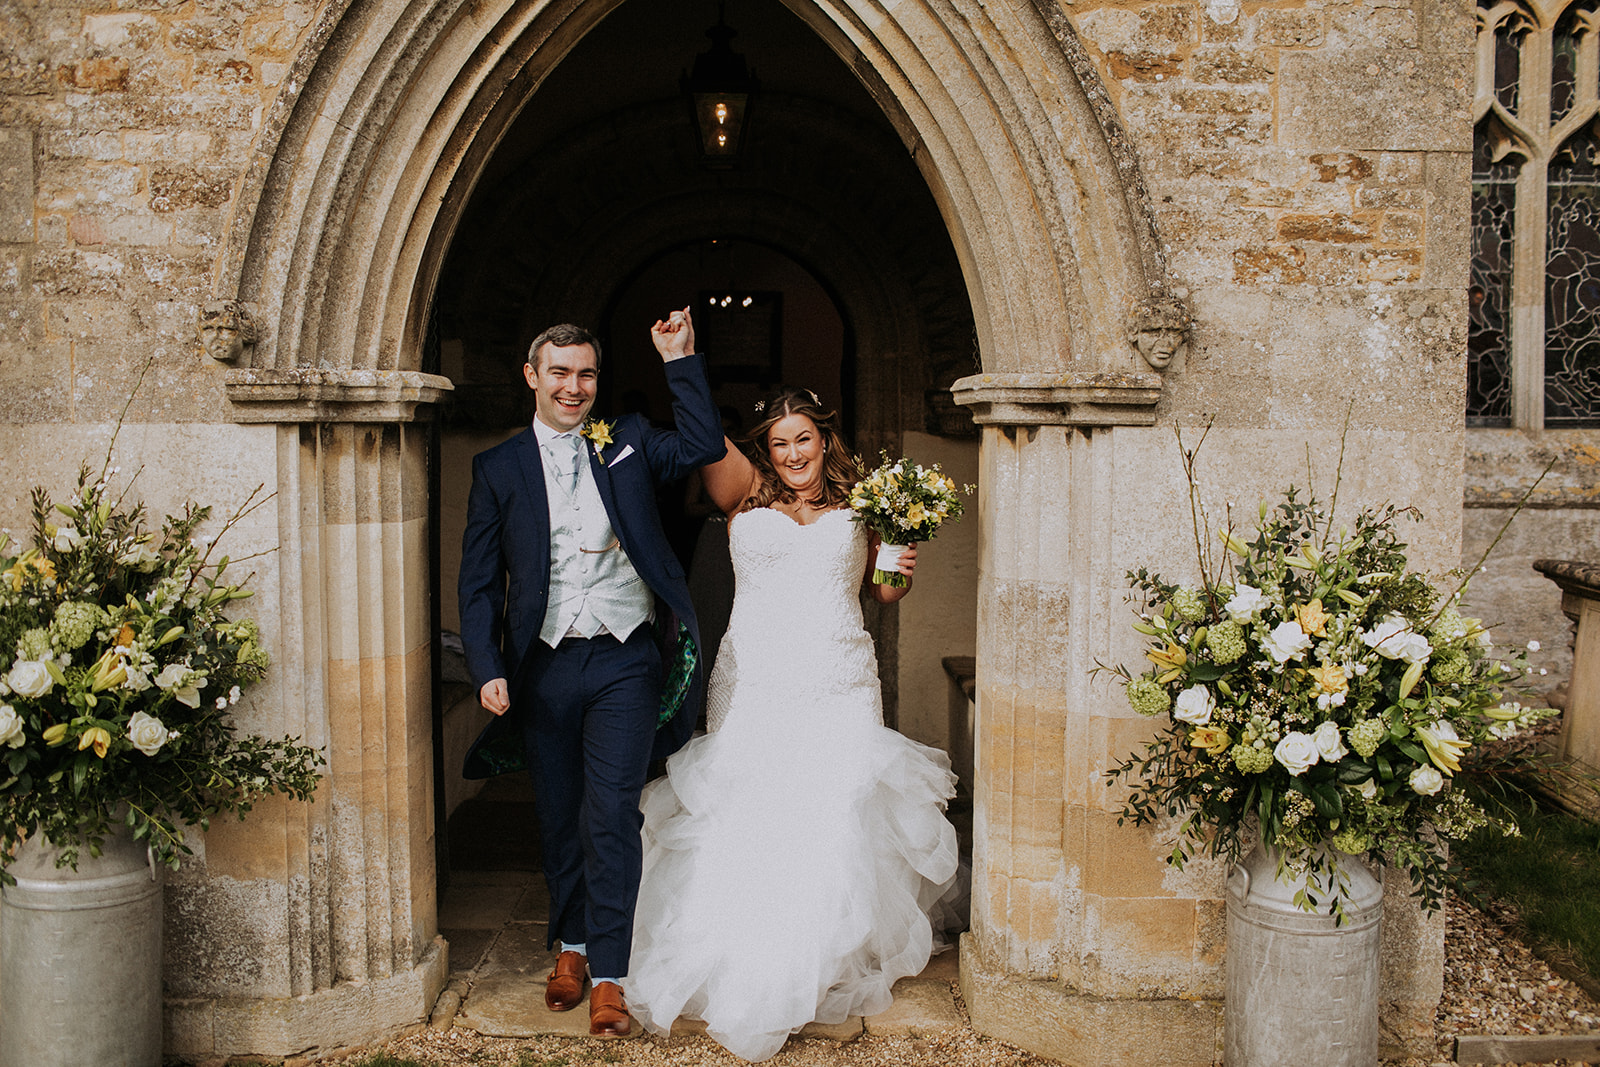 rutland wedding - fun wedding - east midlands wedding planner - Leicestershire wedding planning - nottingham wedding planning - happy wedding photos